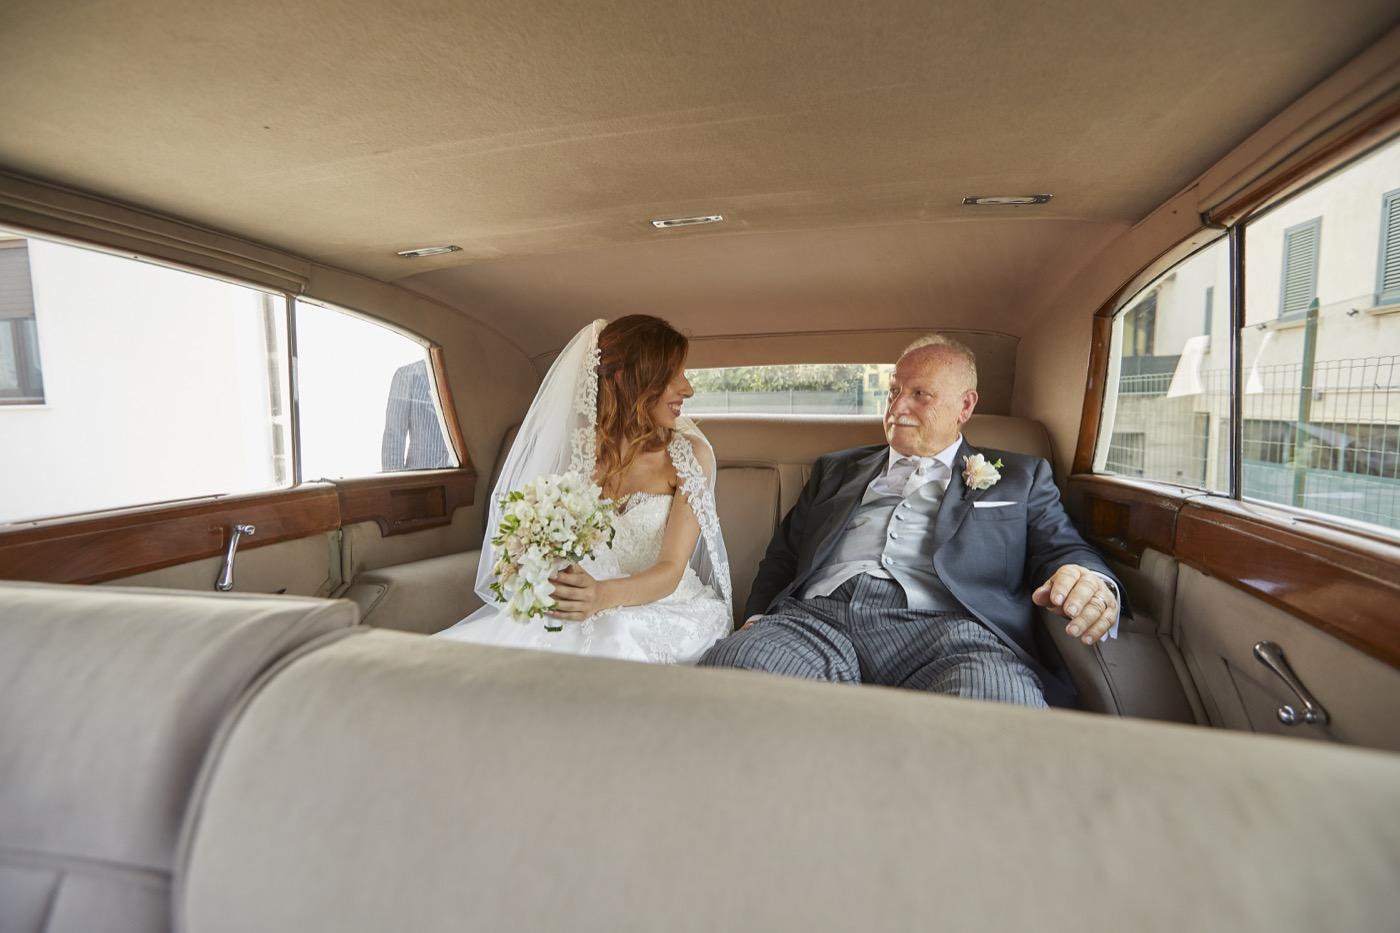 Claudio-Coppola-wedding-photographer-abbazia-7-frati-piegaro-36